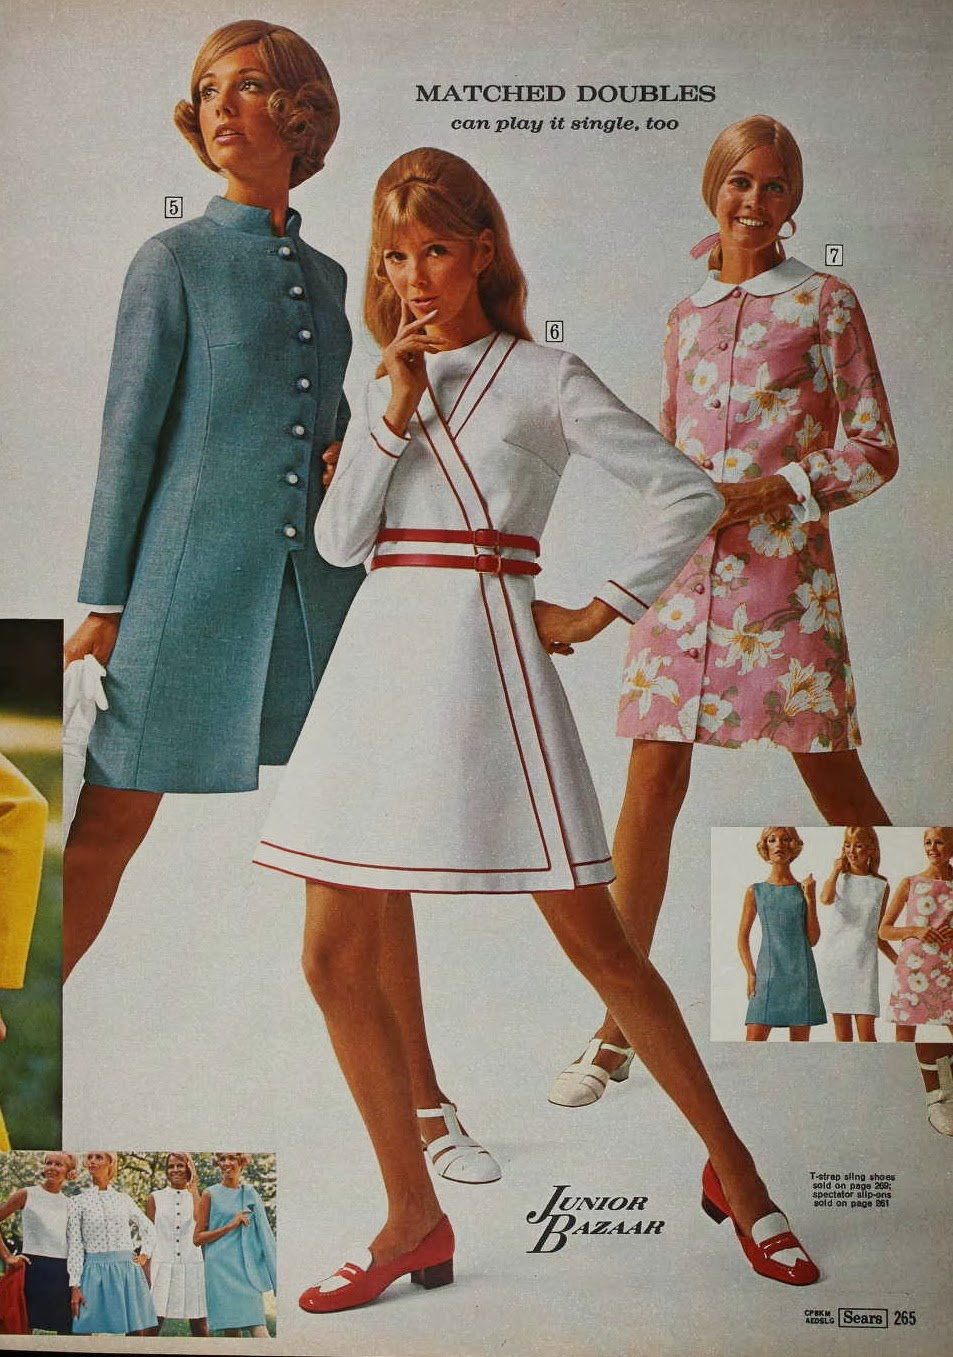 1979 Fashion Sears Dress Catalog